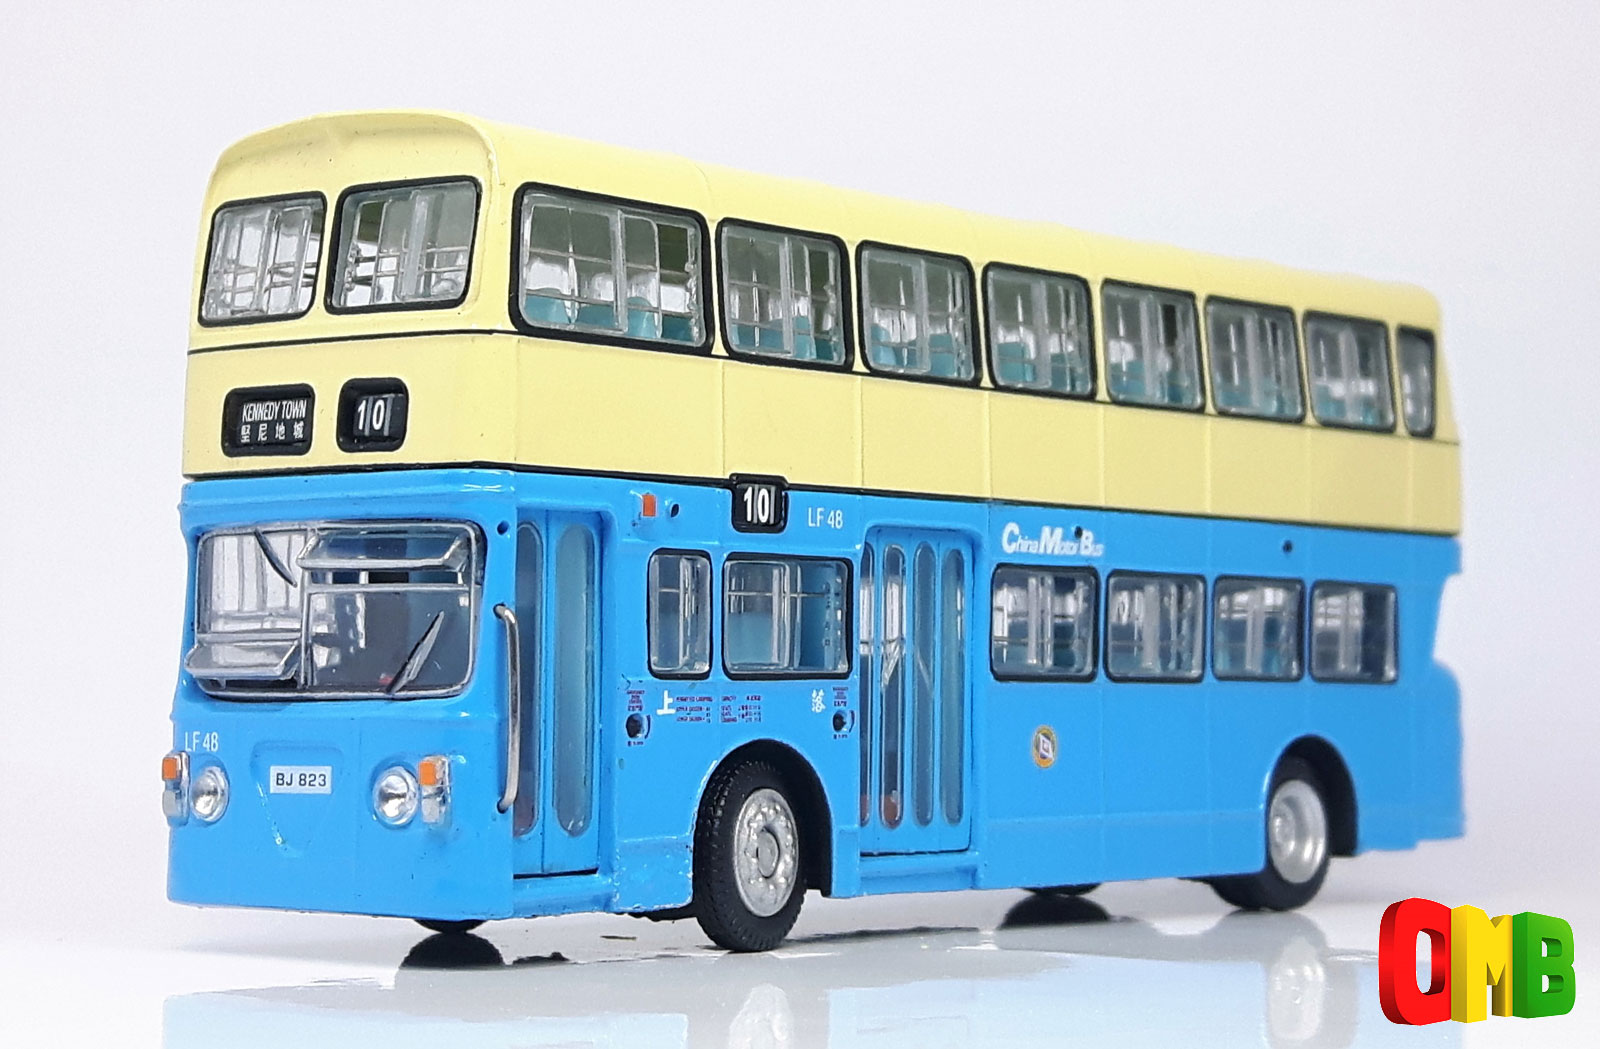 000111 - Daimler Fleetline/Alexander 'LF' - China Motor ...